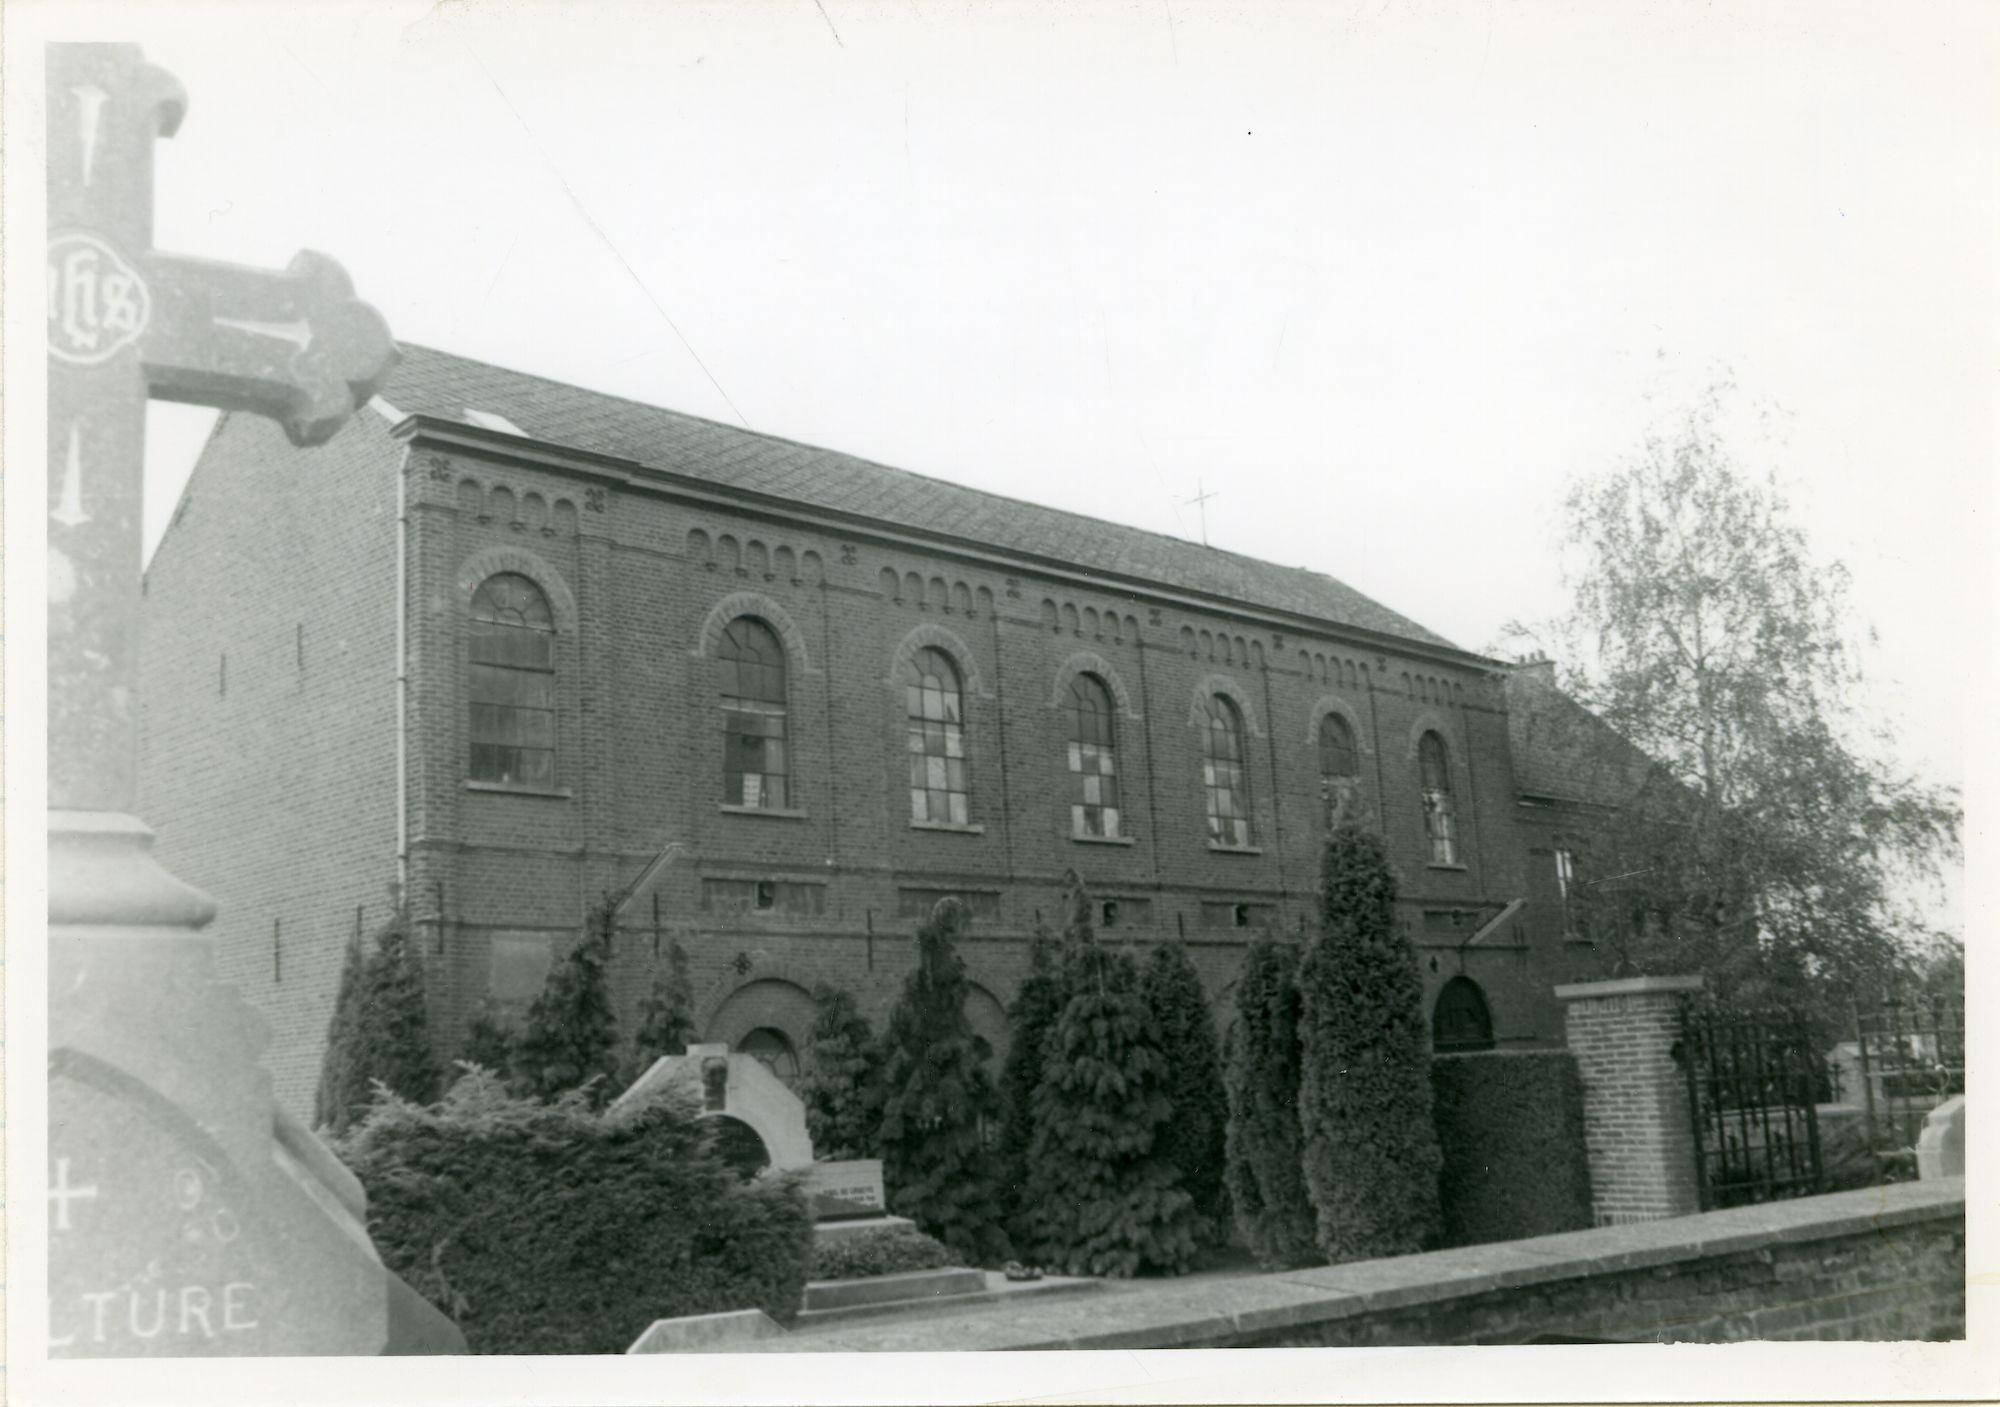 Mariakerke: Mariakerkeplein: kerkhof en gebouw